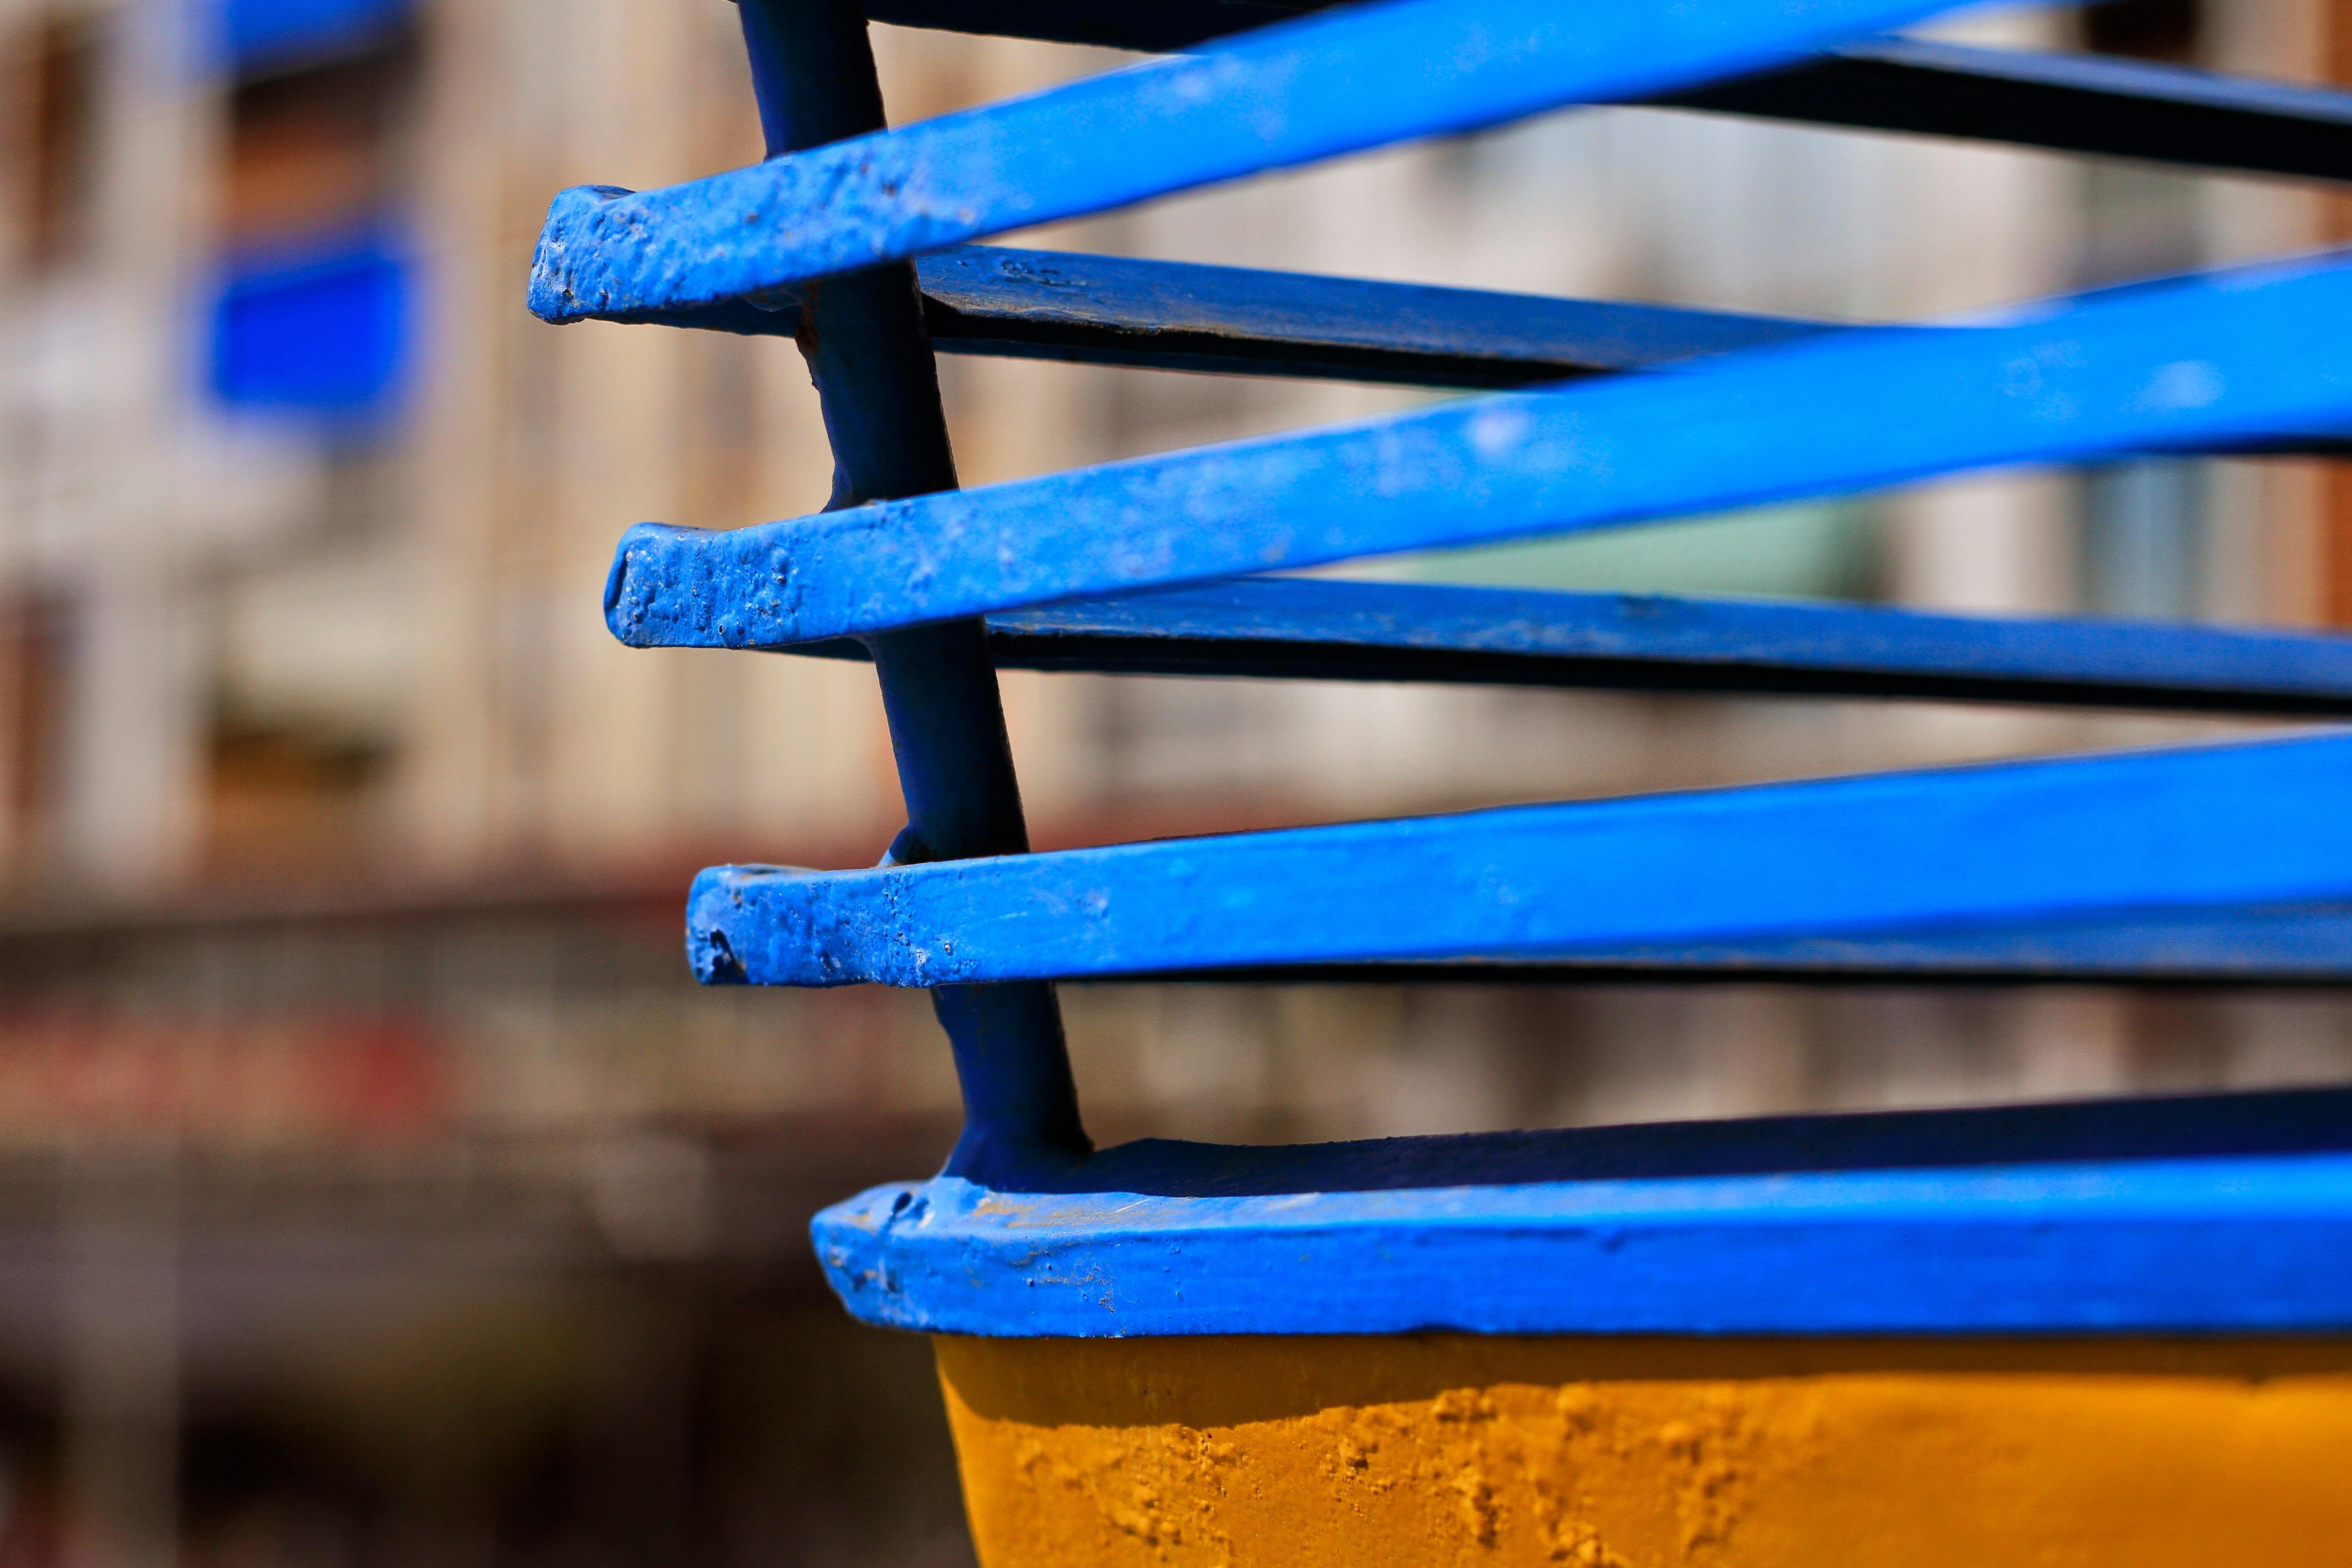 Fotos gratis : línea, vehículo, color, azul, amarillo, material ...